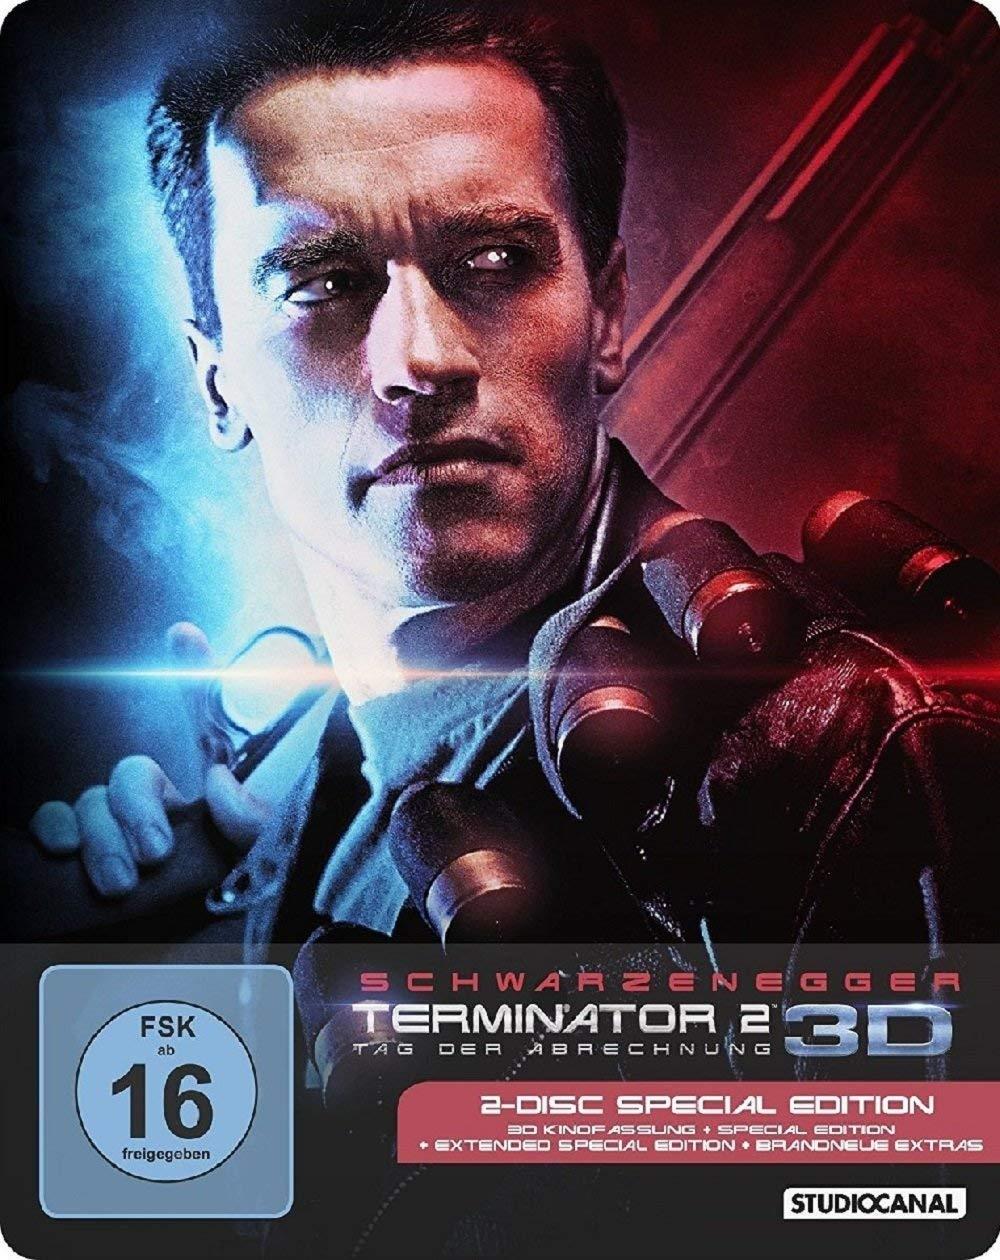 Terminator 2 - Tag der Abrechnung 3D - Limited Steelbook Edition (3D Blu-ray + Blu-ray) für 12,98€ (JPC)